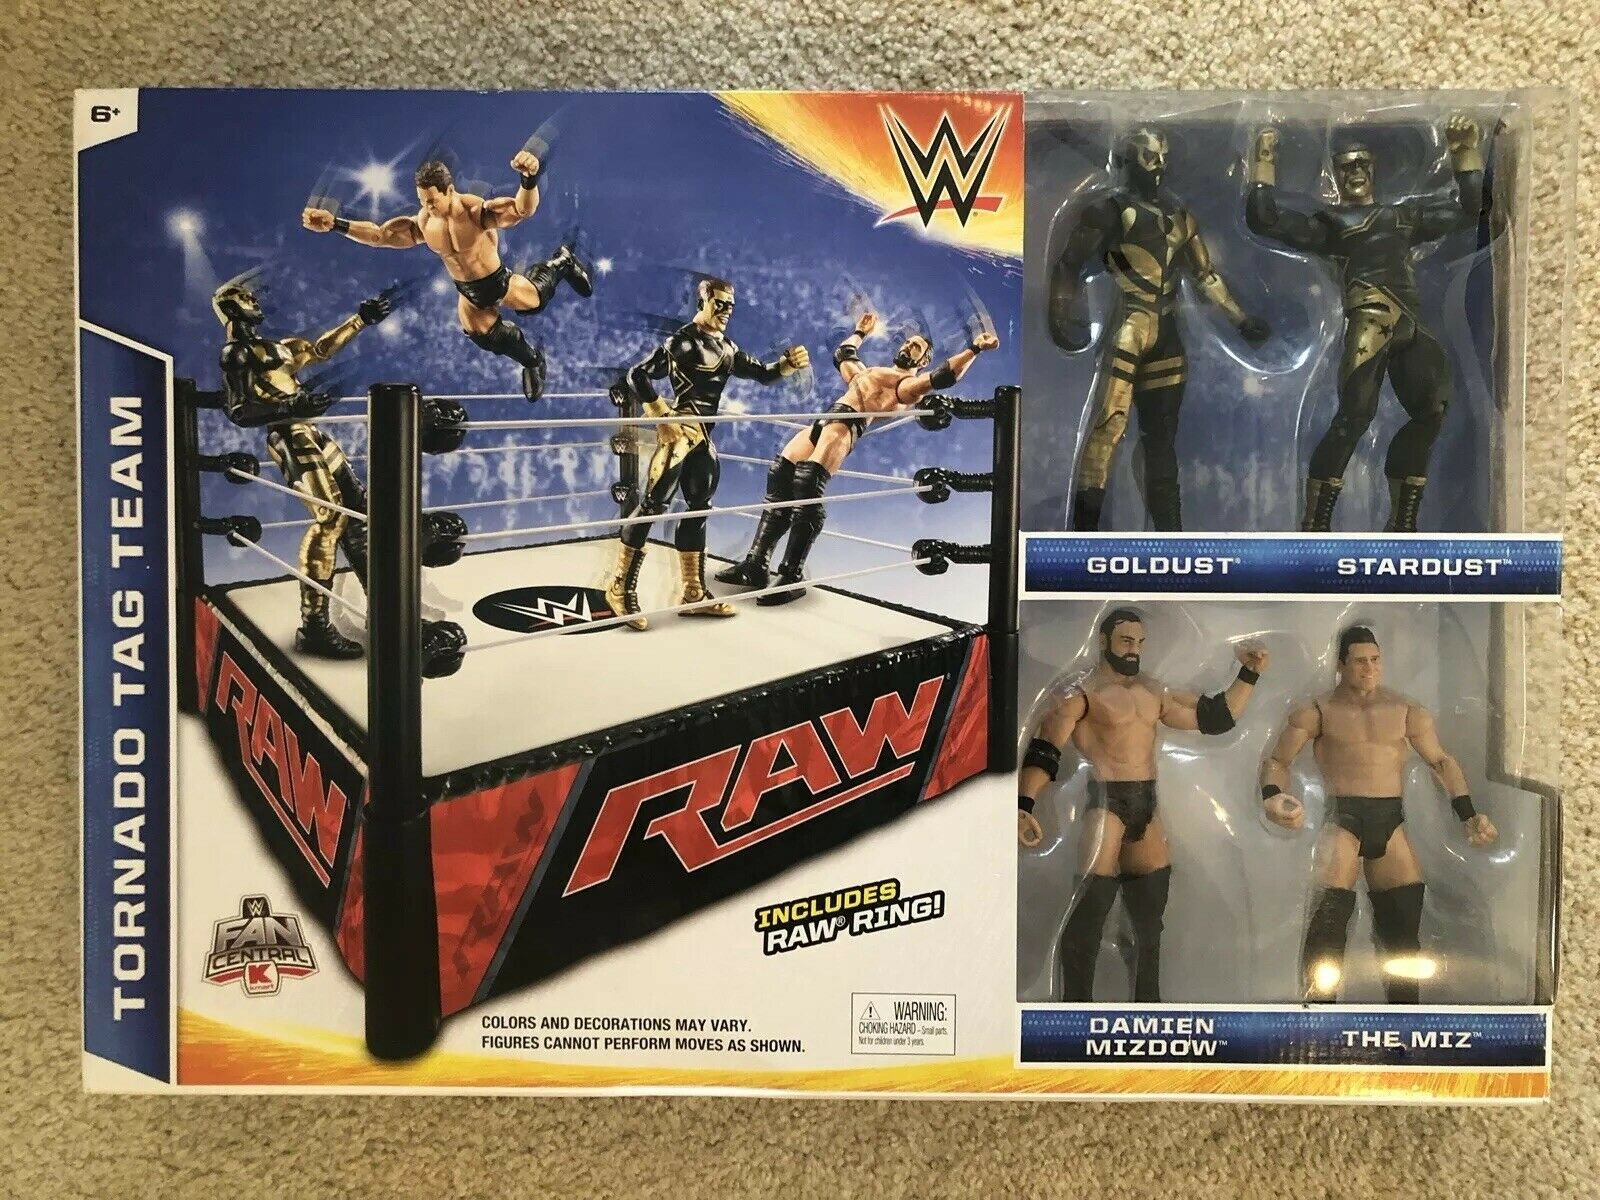 WWE Tornado Tag Team Raw  bague avec orust, Stardust mizdow & Zim  Neuf en boîte 2015 rare  promotions d'équipe